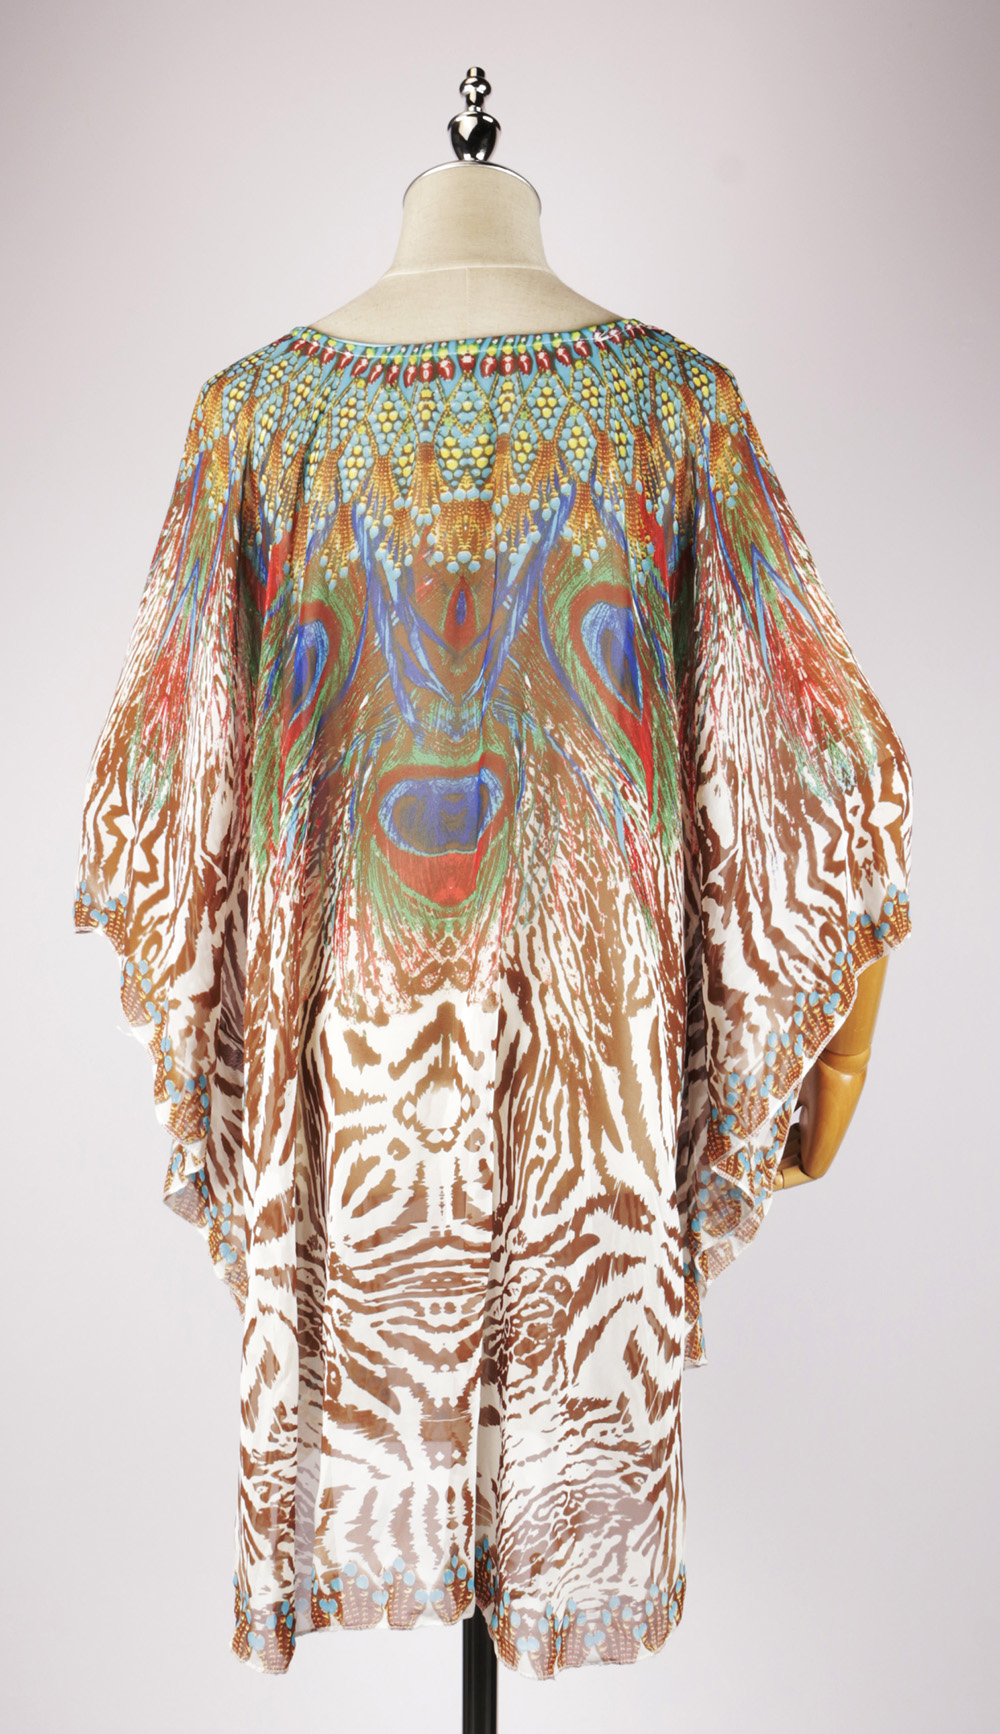 DGS2257 back,Moroccan kaftan dresses